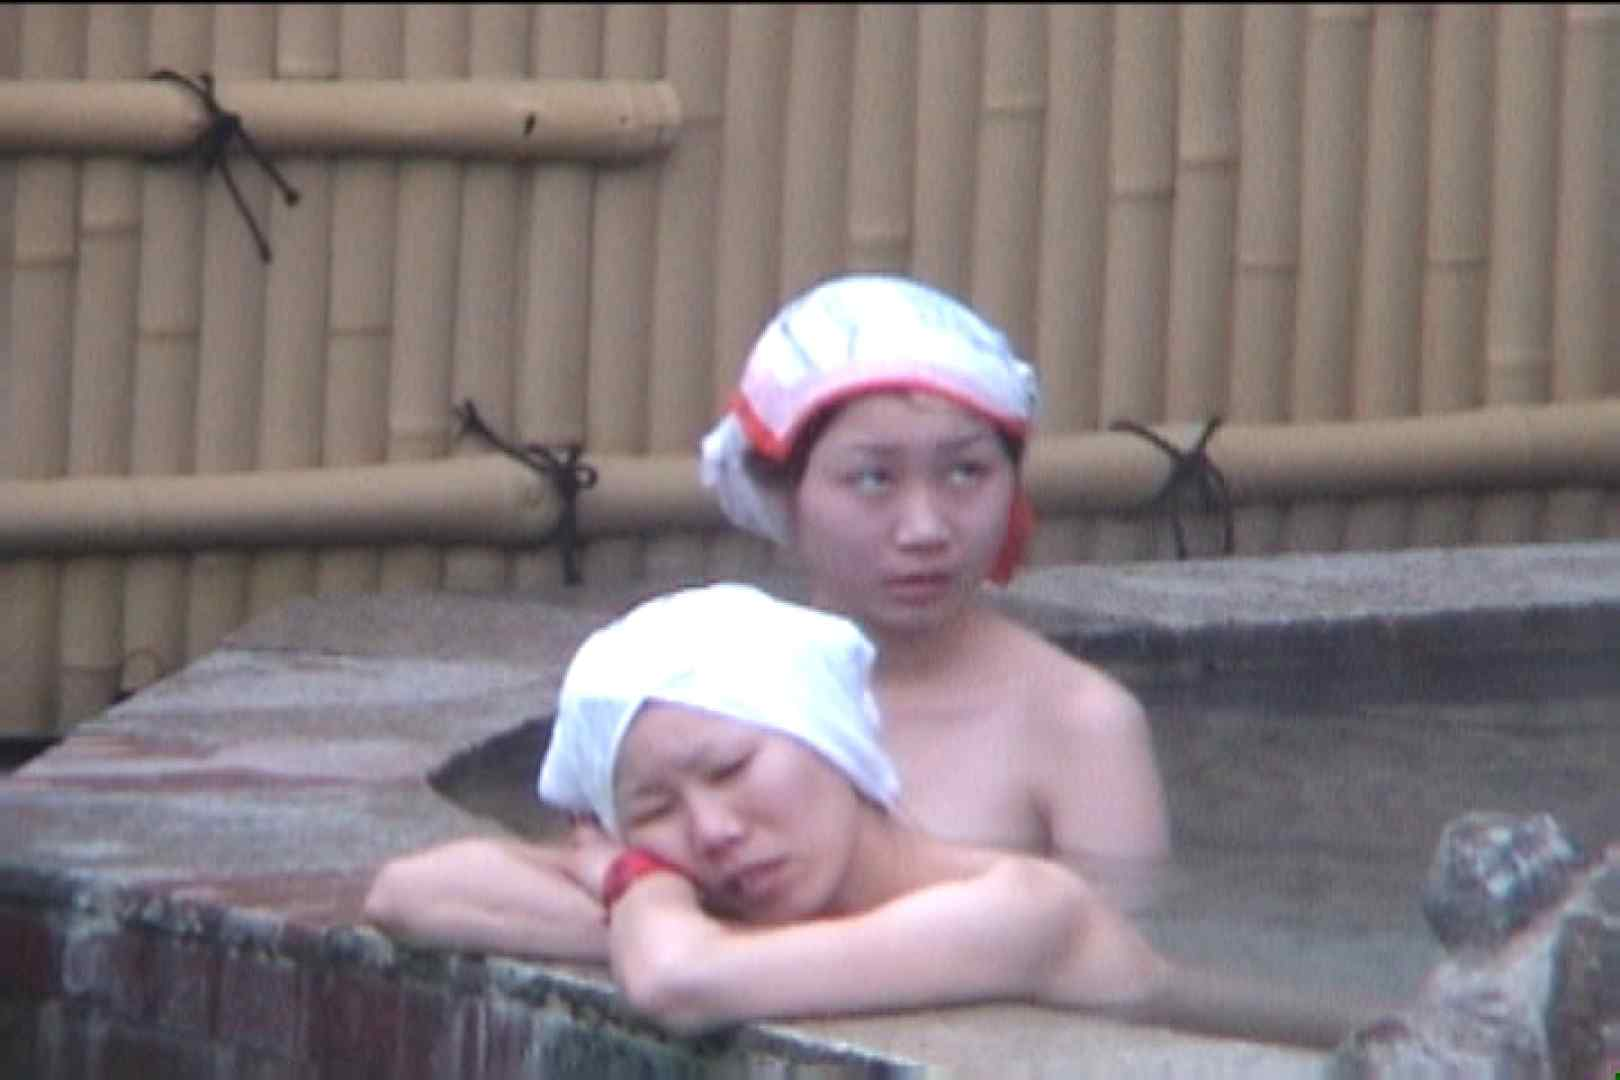 Aquaな露天風呂Vol.91【VIP限定】 盗撮師作品  77pic 21